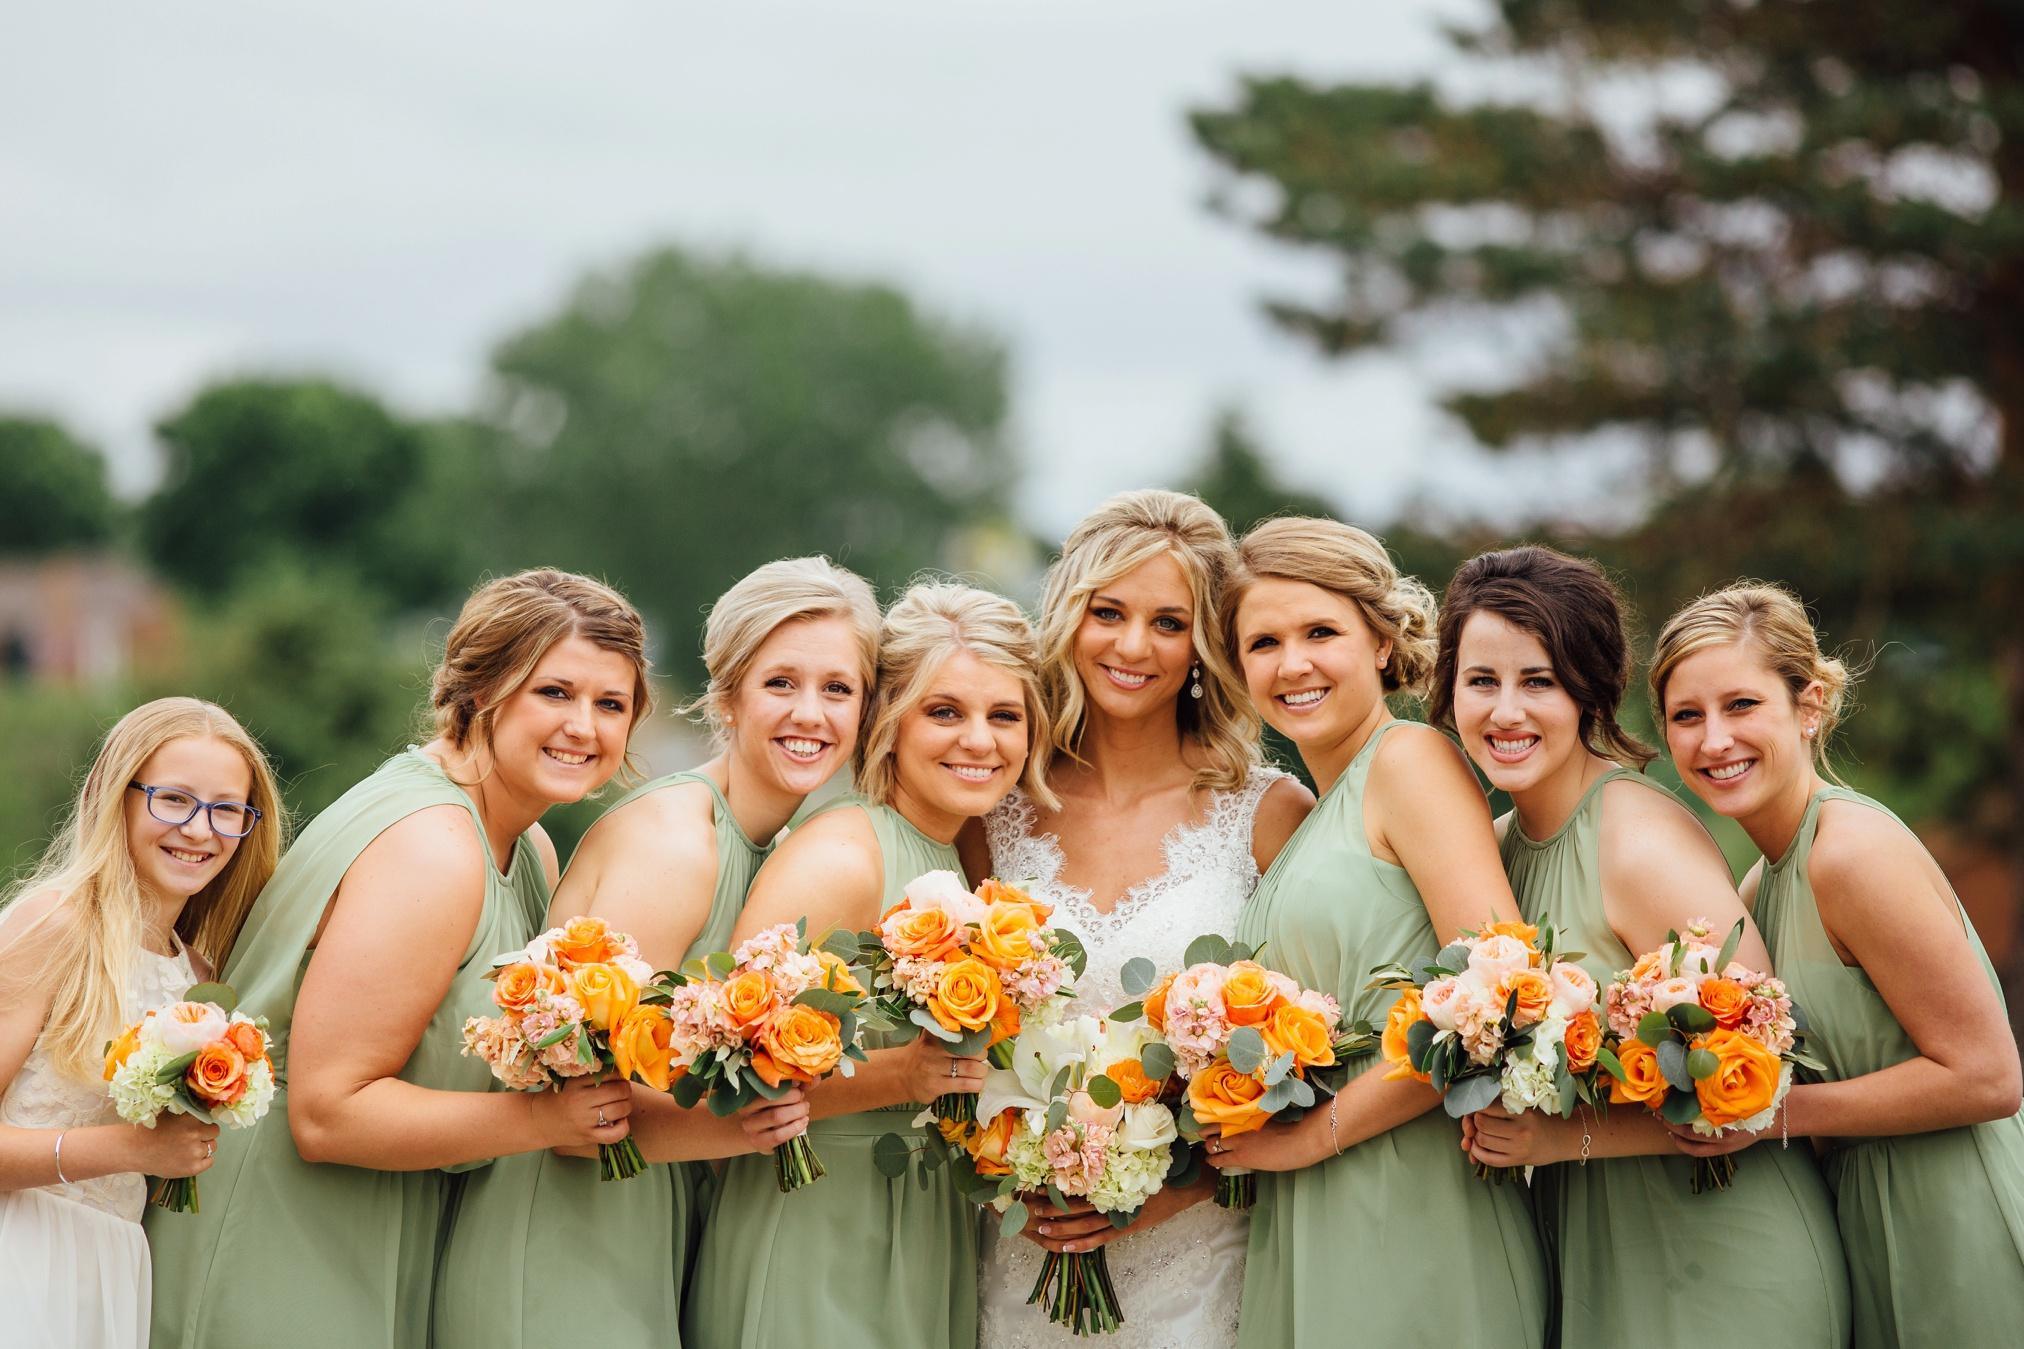 schmid_wedding-136.jpg